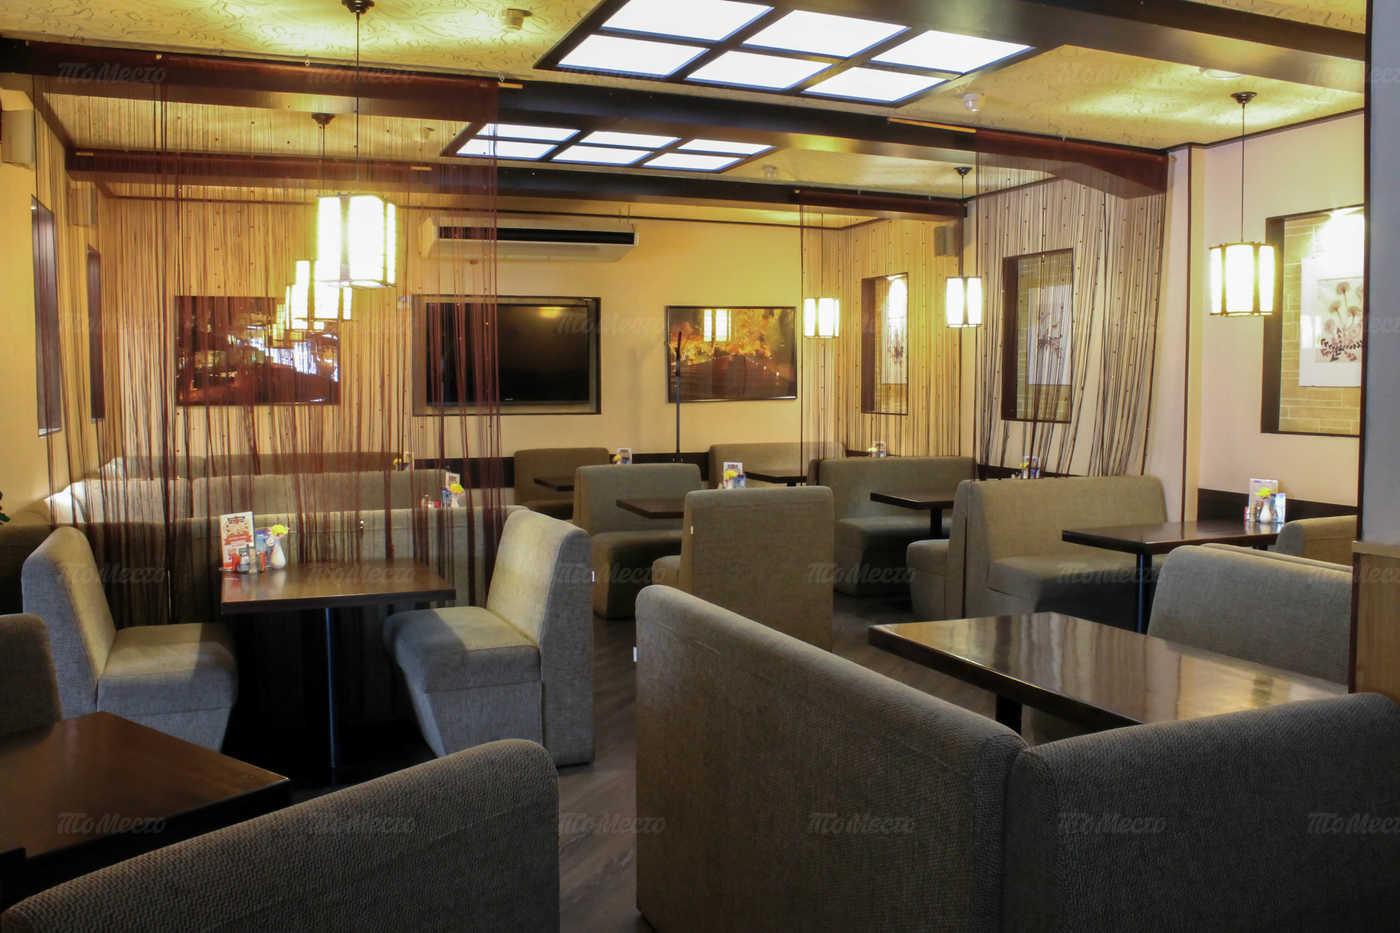 Меню кафе Япона мама на улице 22 Партсъезда